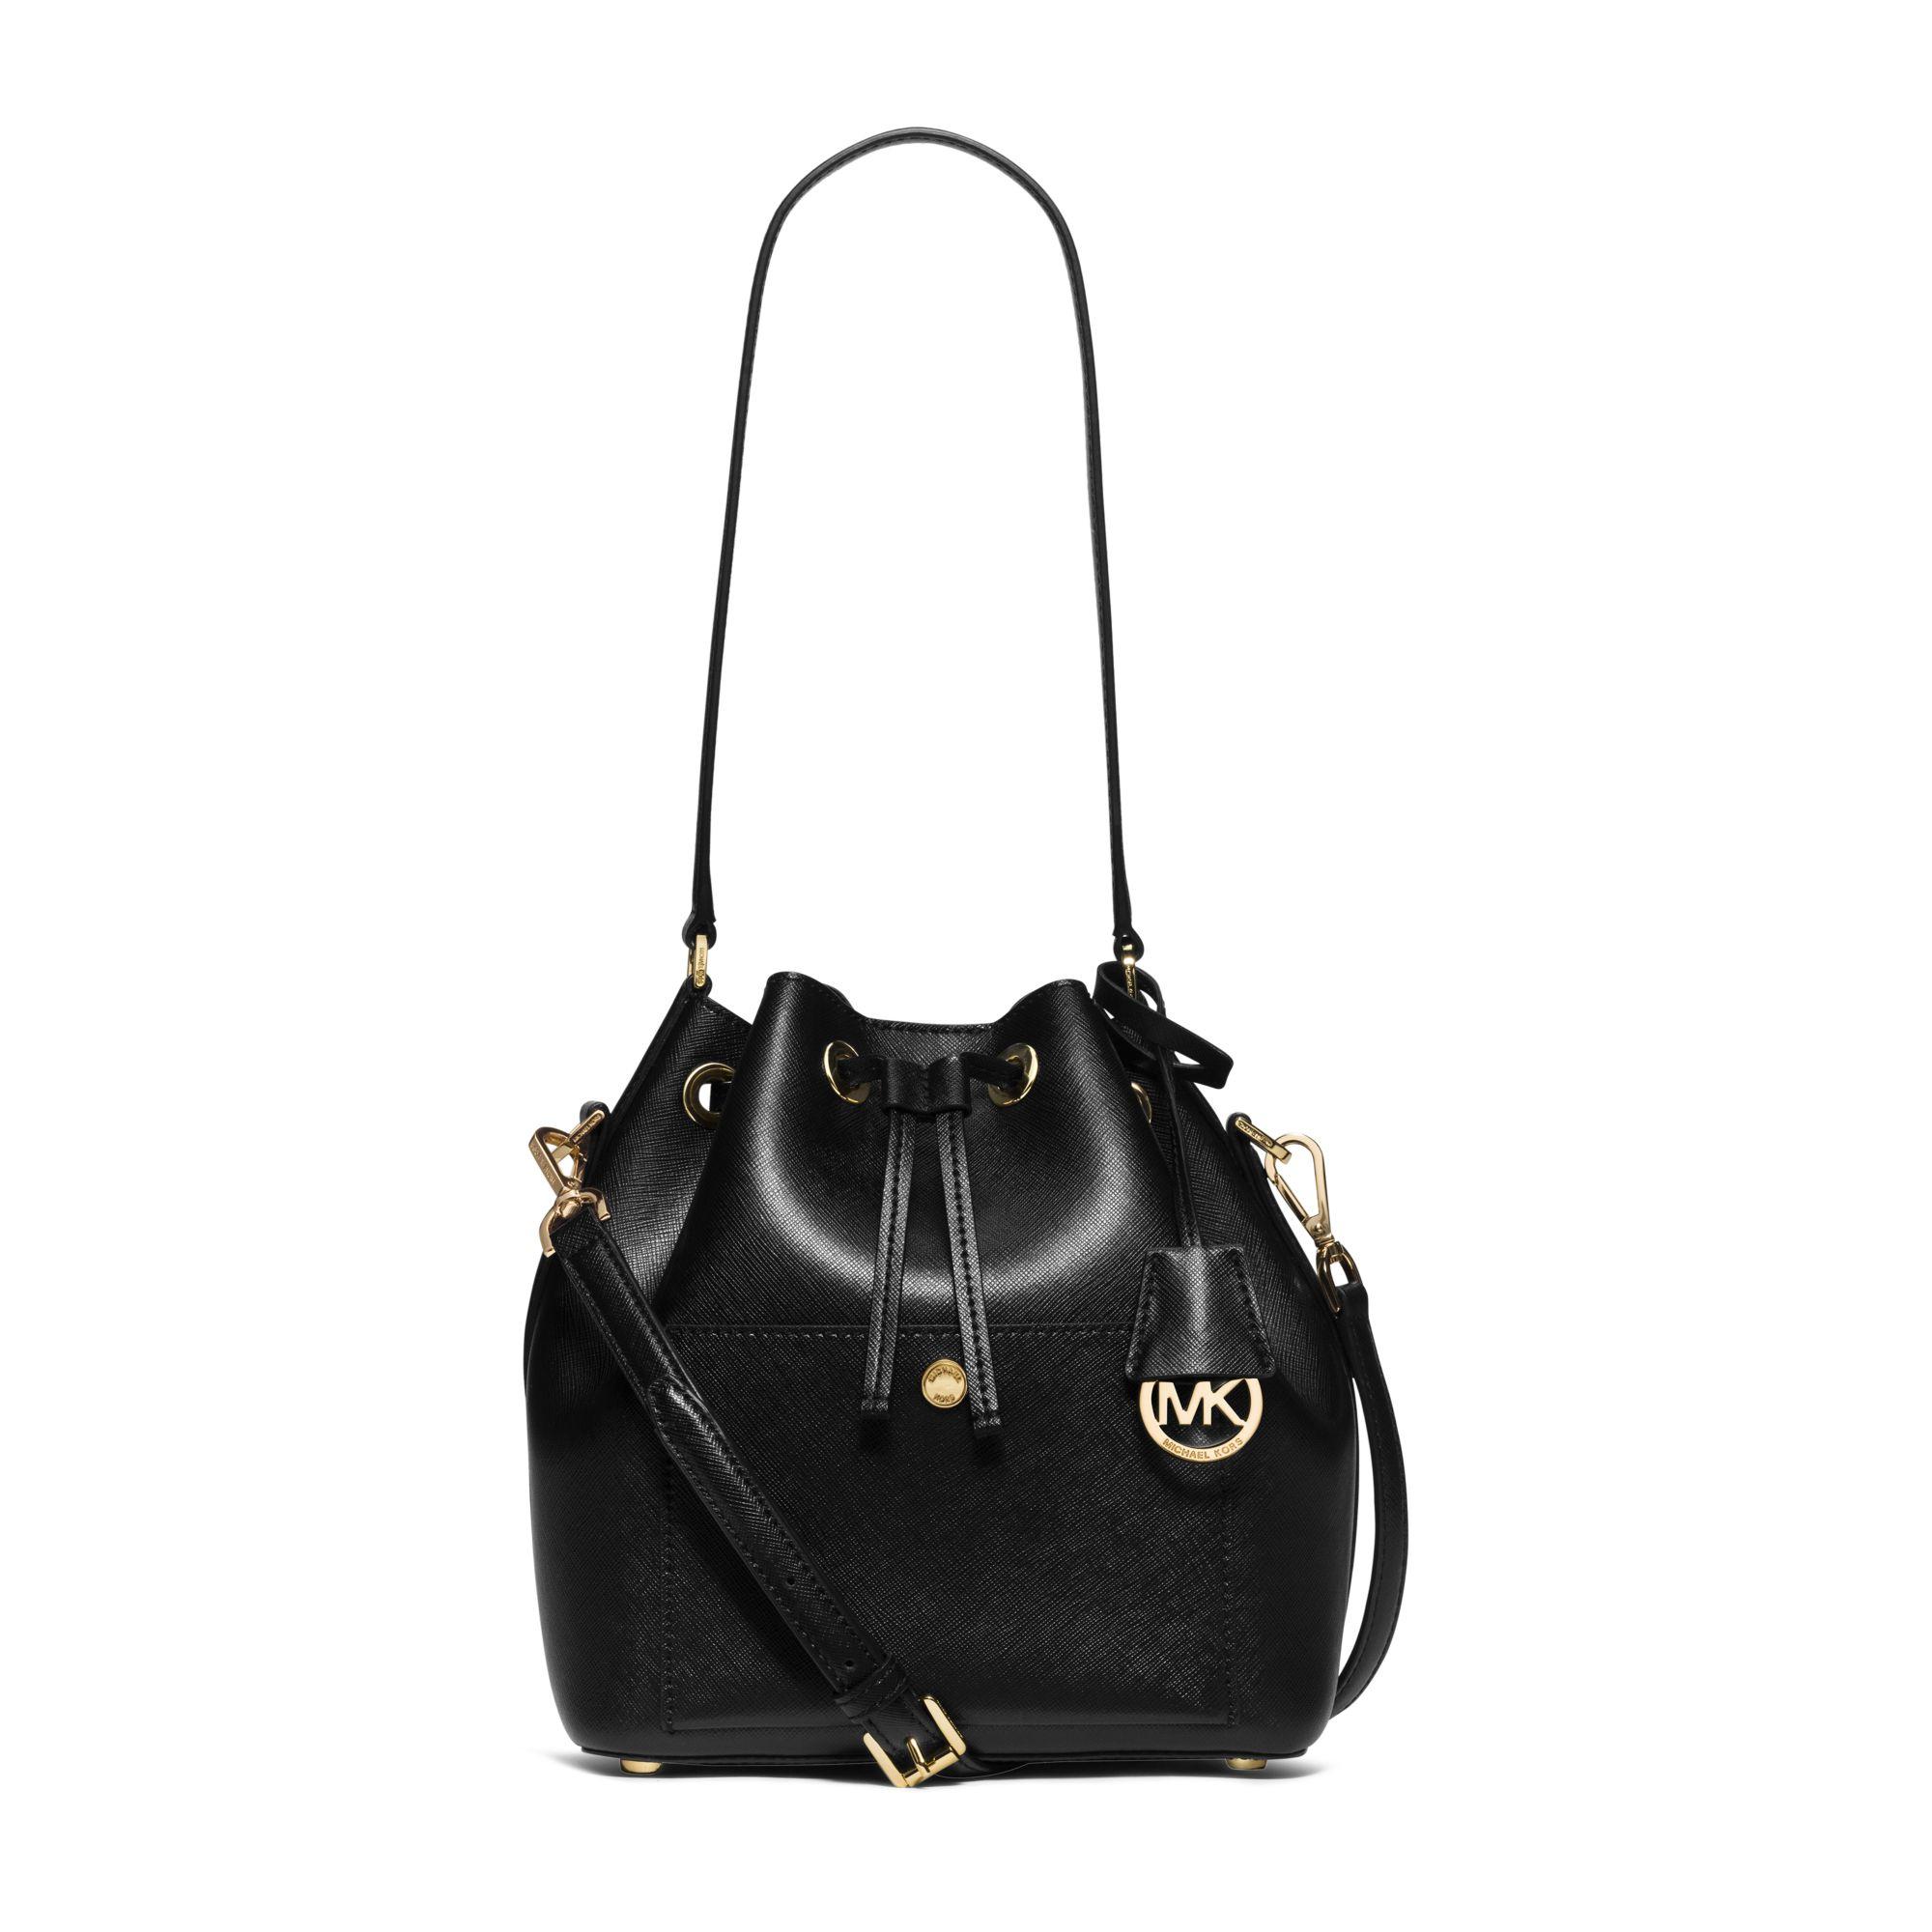 Lyst Michael Kors Greenwich Saffiano Leather Bucket Bag